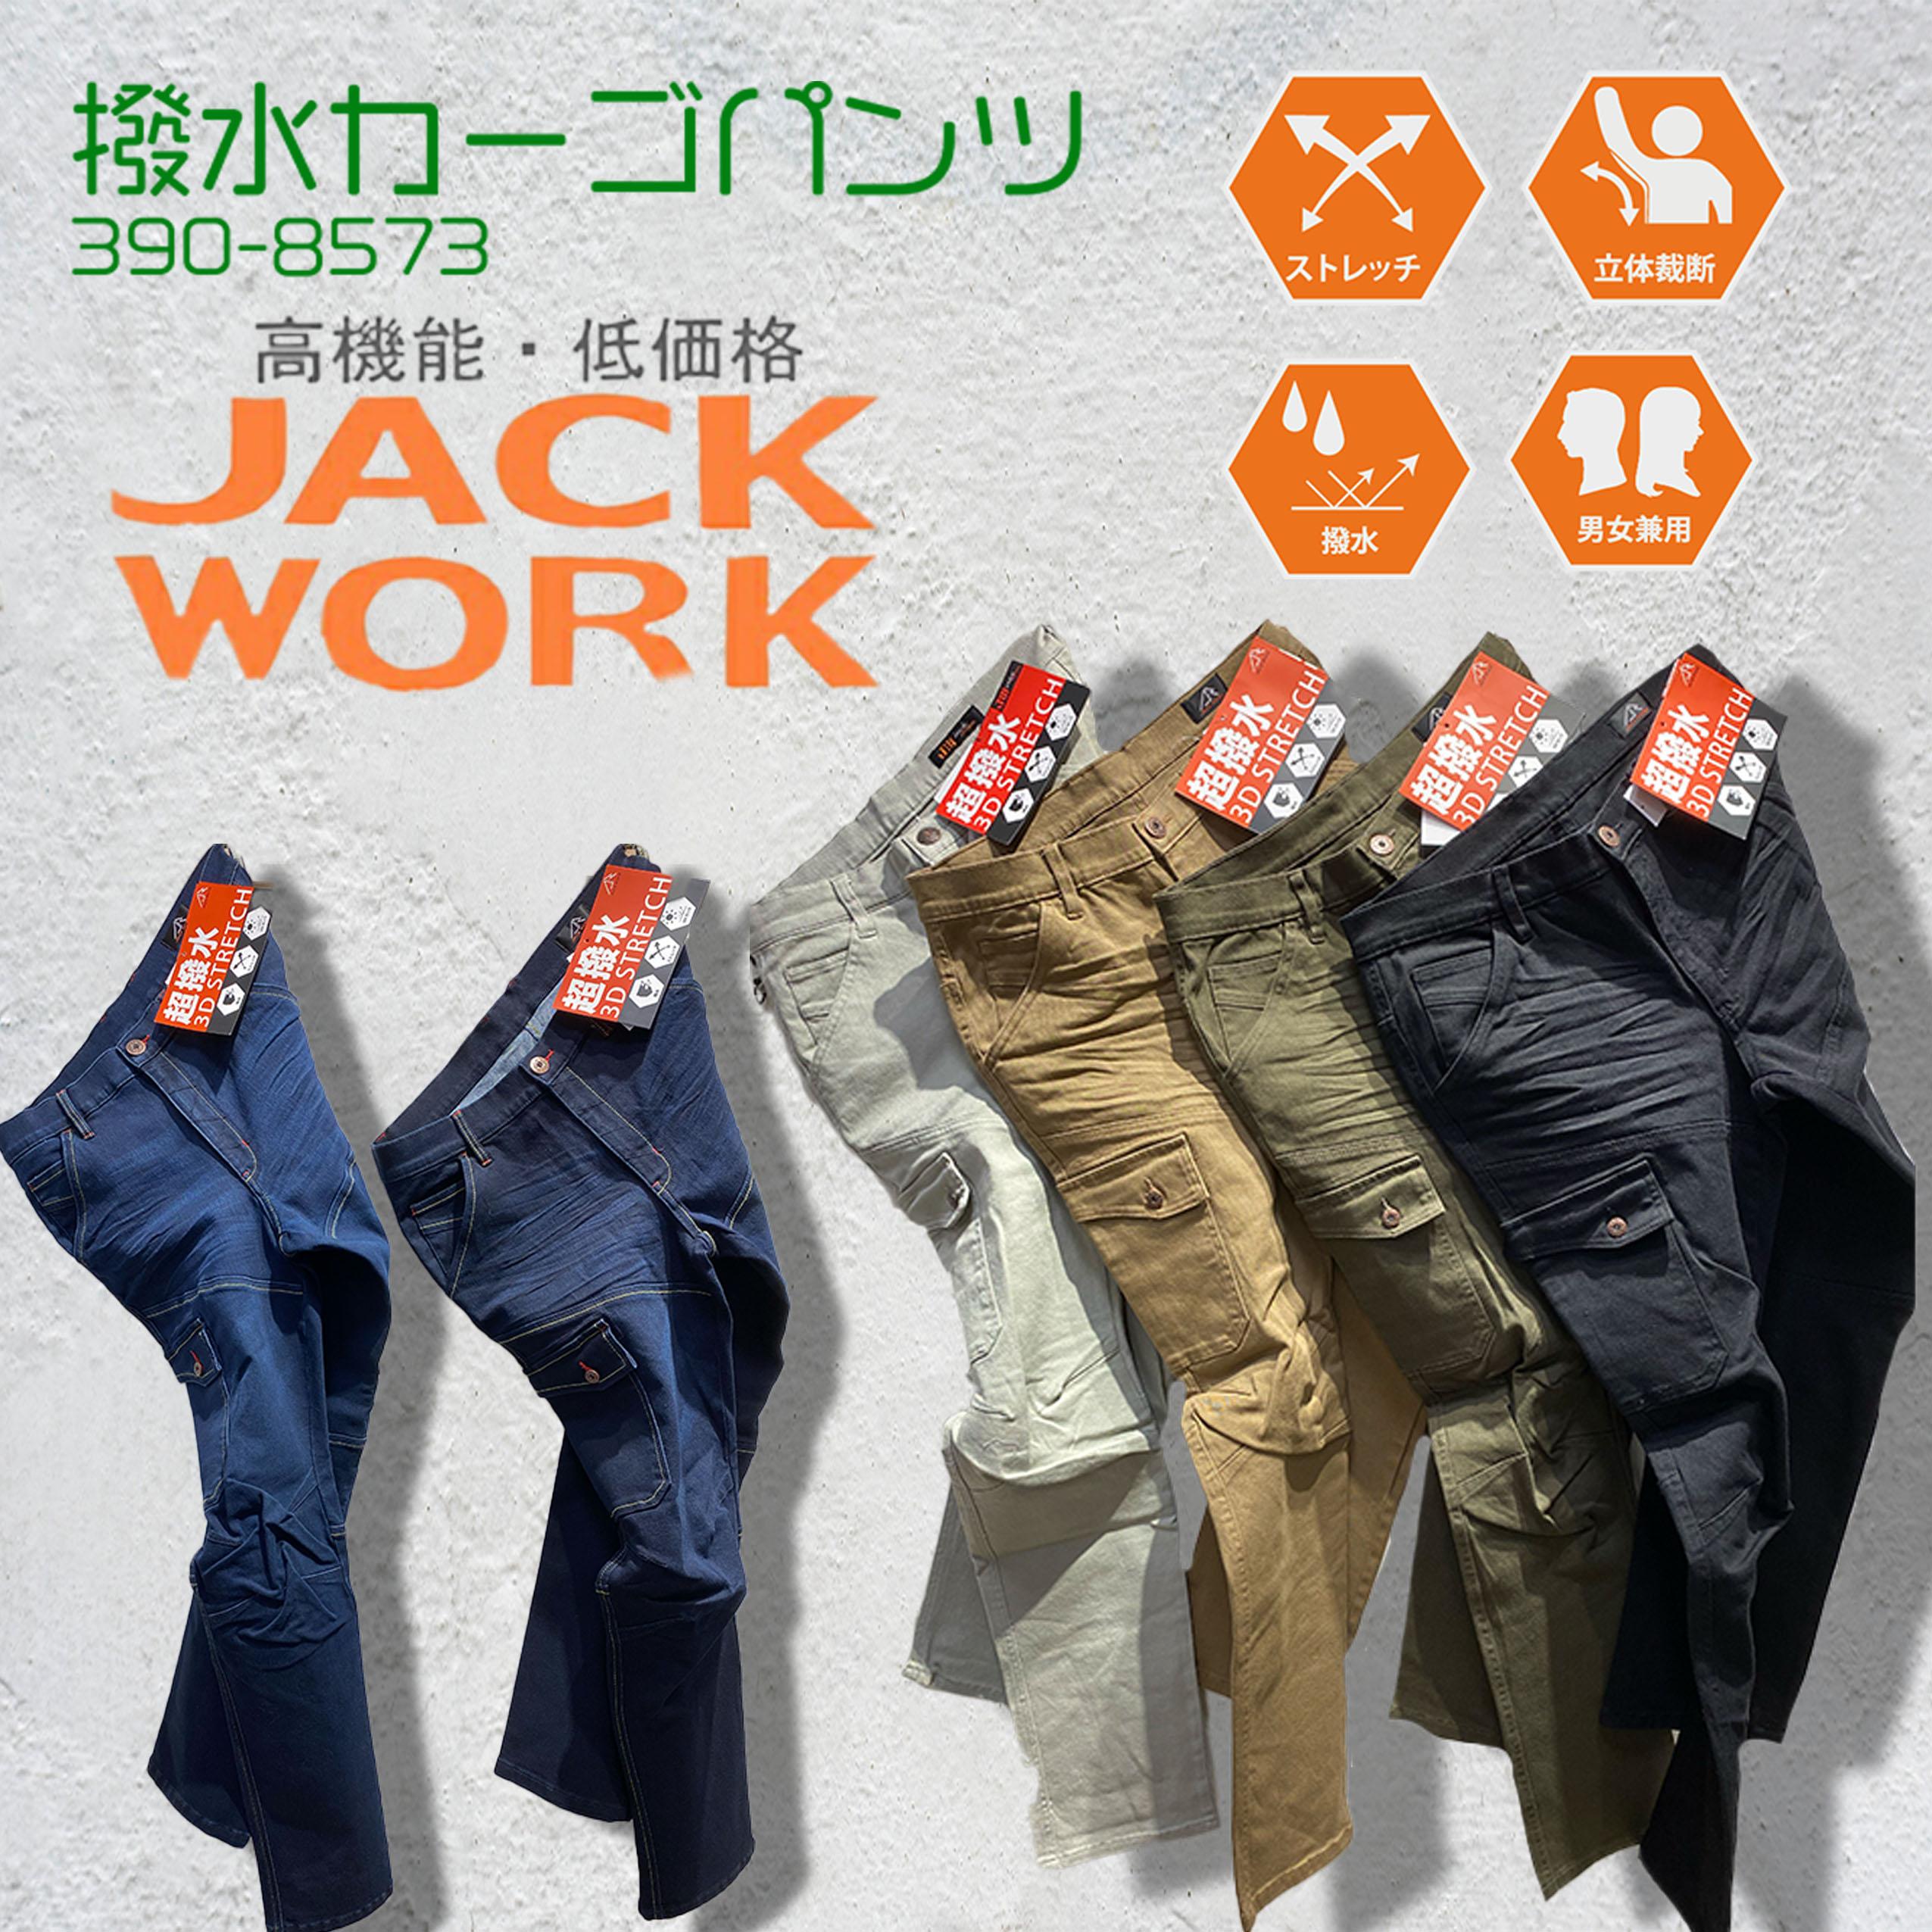 【JACK WORK】超撥水カーゴパンツ